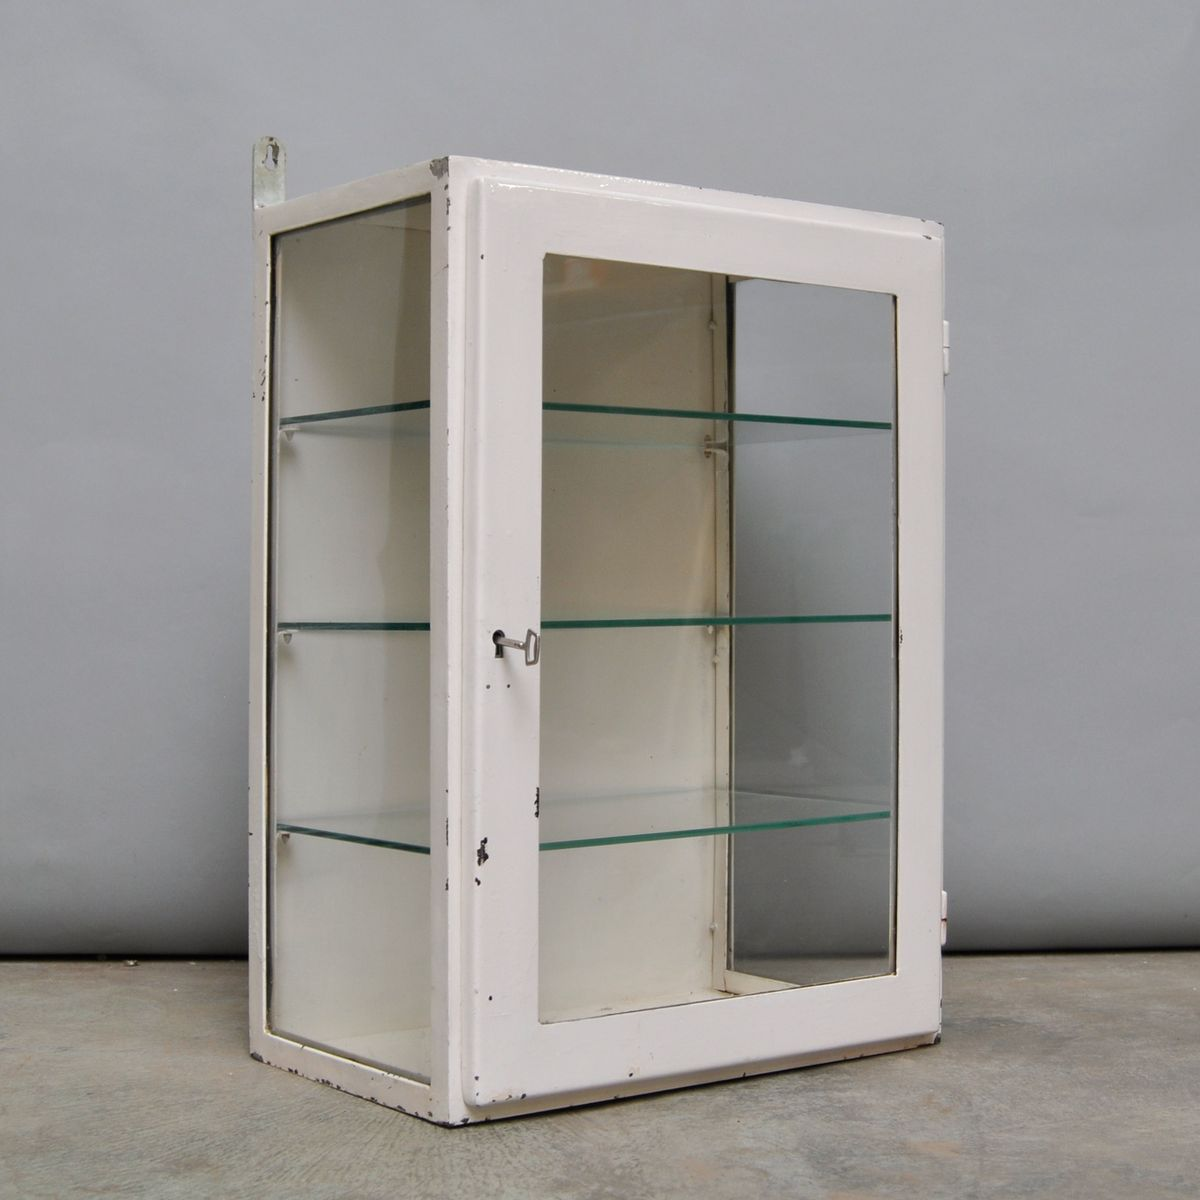 Petit meuble de rangement medical suspendu 1960s en vente for Meuble de rangement suspendu